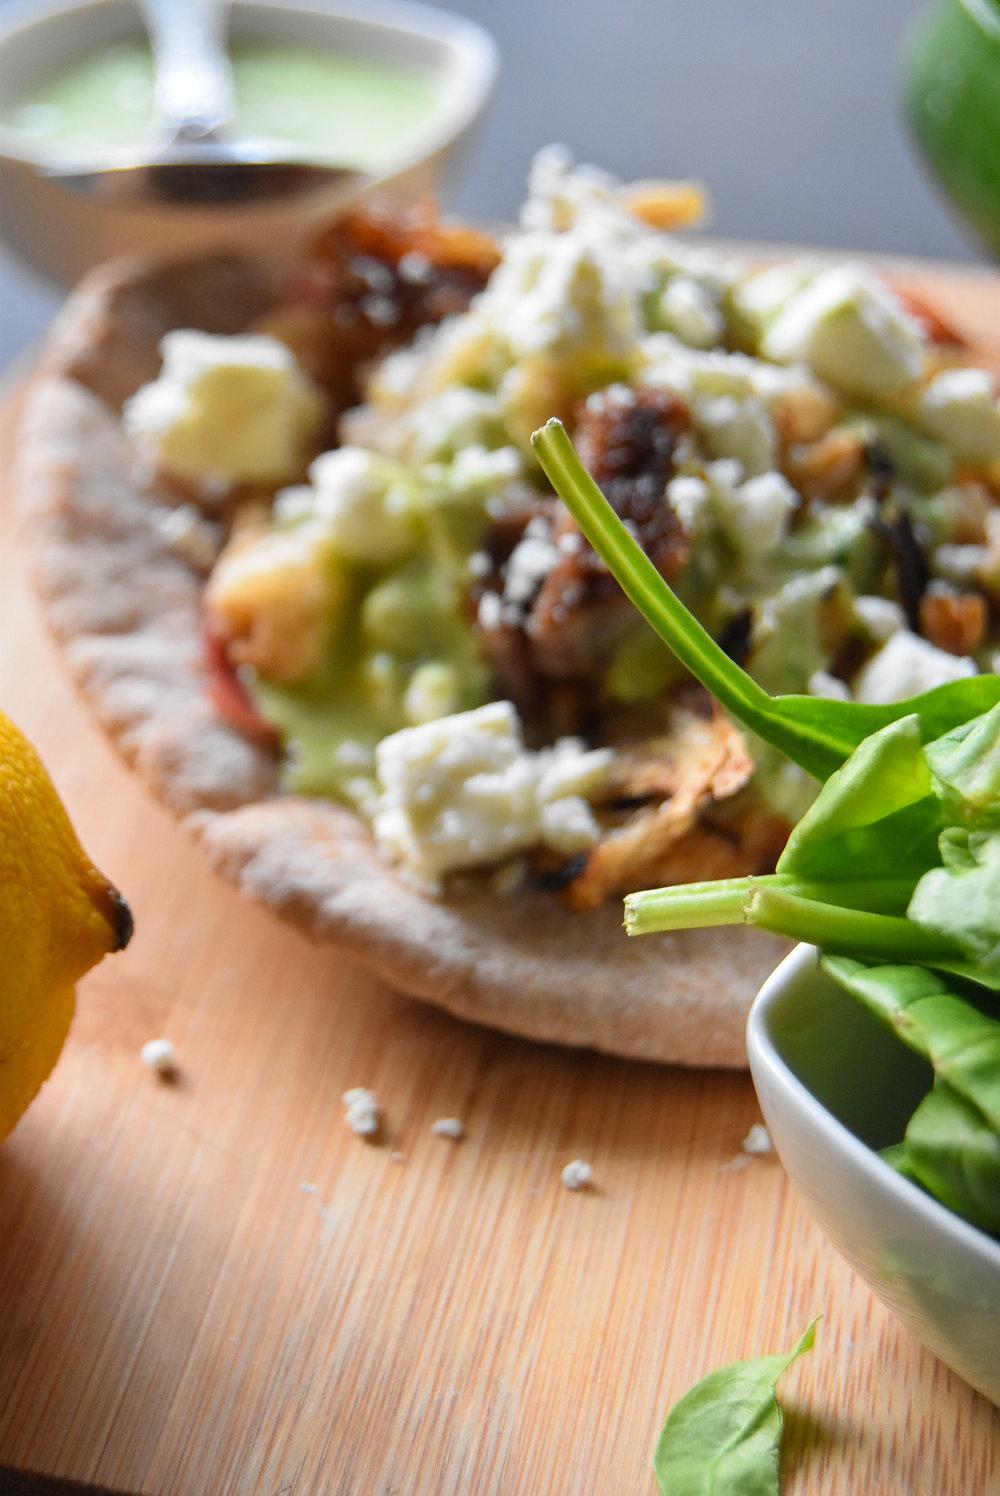 Cauliflower Shawarma Wraps with Green Tahini and Feta 3.jpg